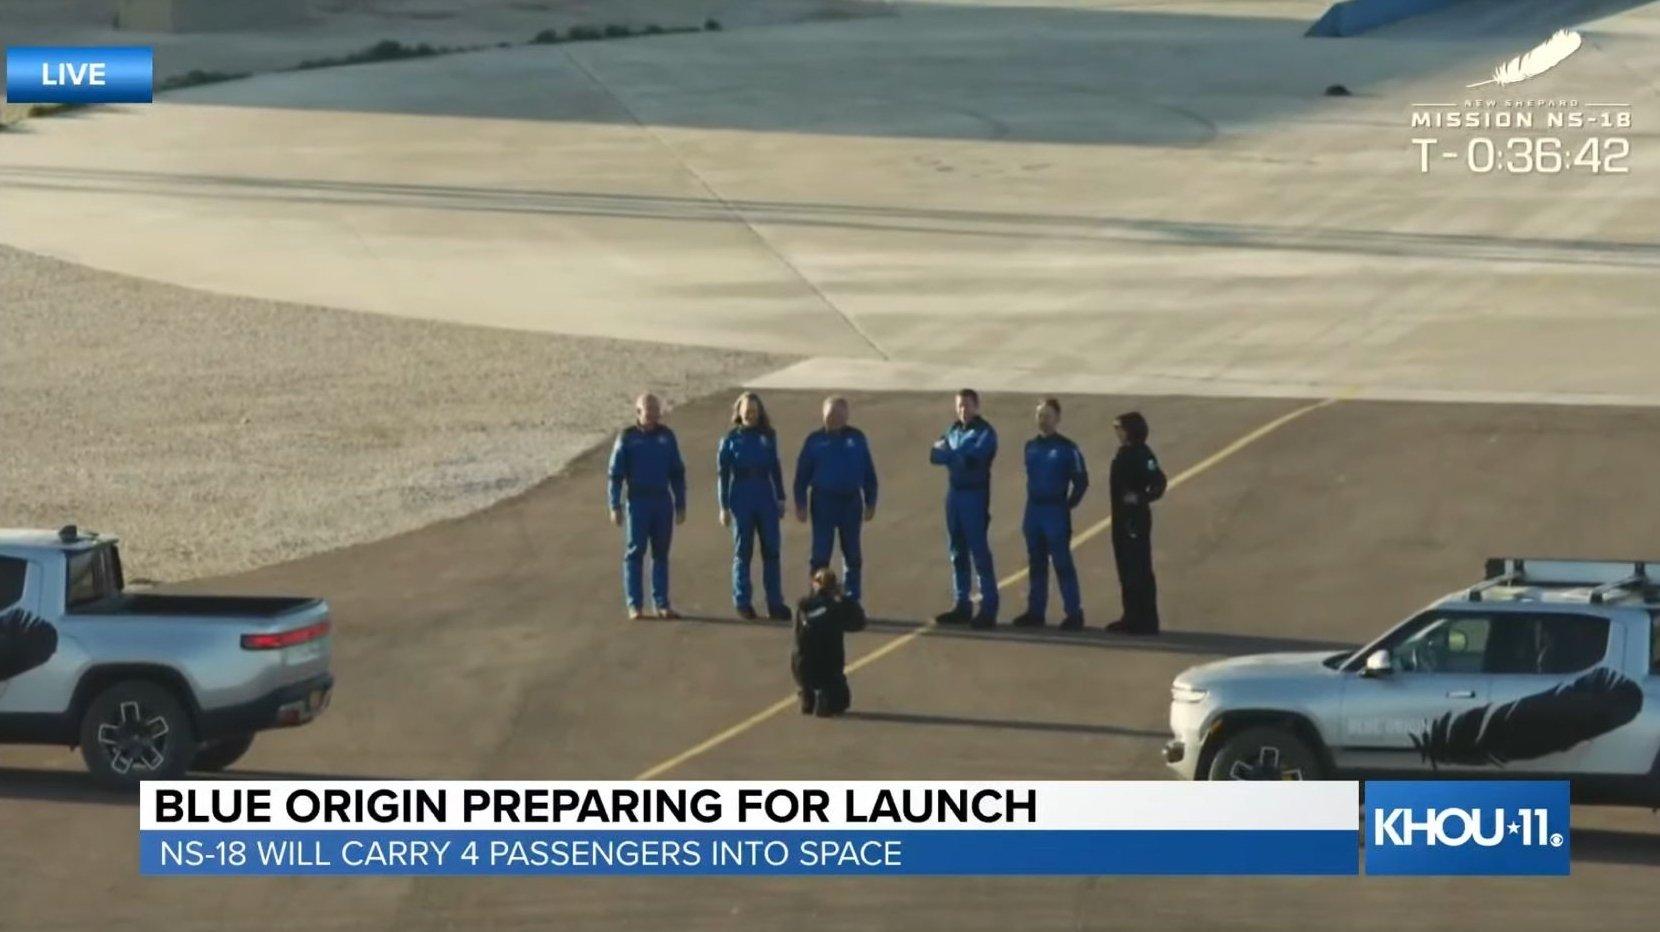 William Shatner take part in New Shepard spacecraft crew